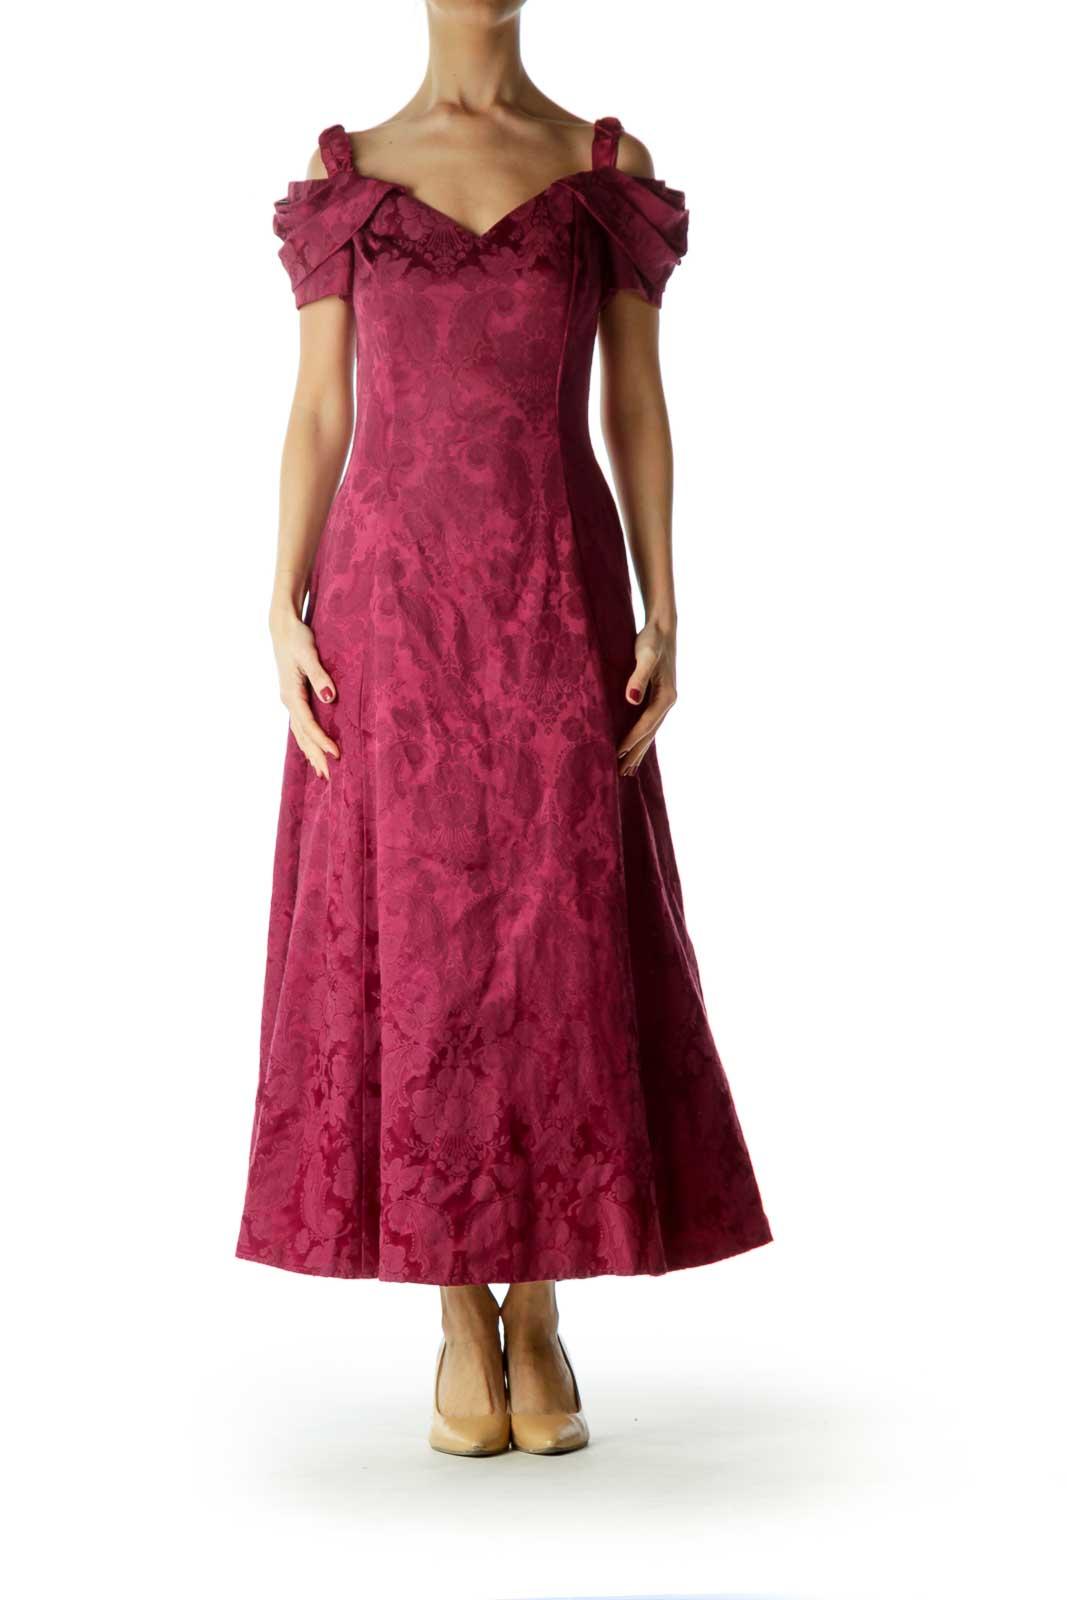 Red Off-Shoulder Tonal Print Dress Front